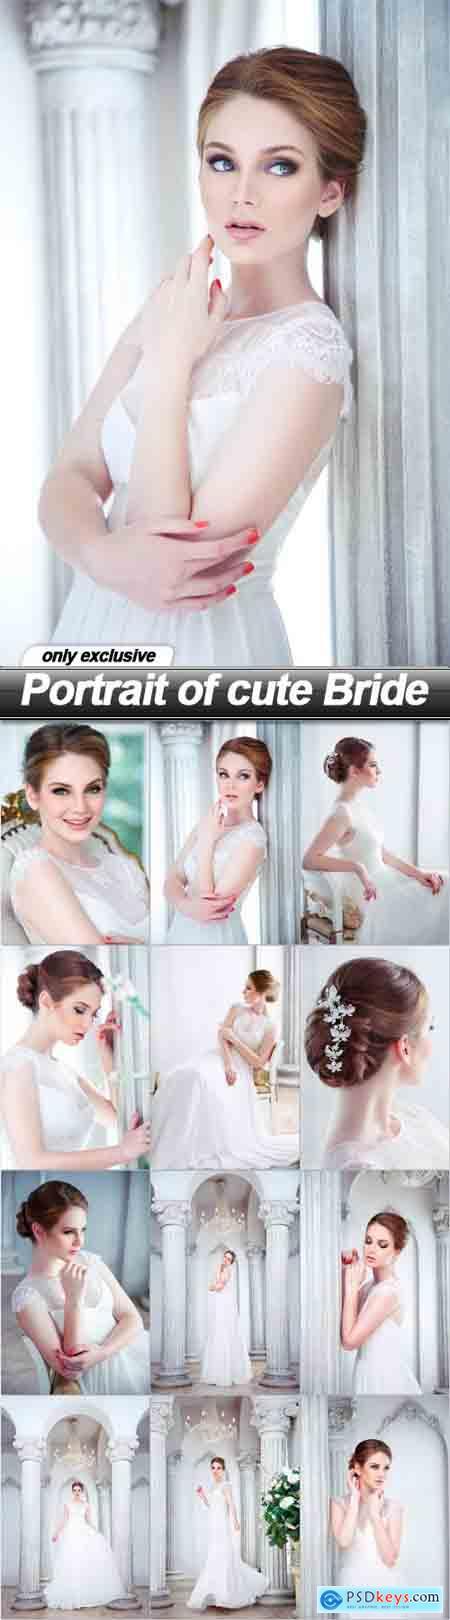 Portrait of cute Bride - 12 UHQ JPEG